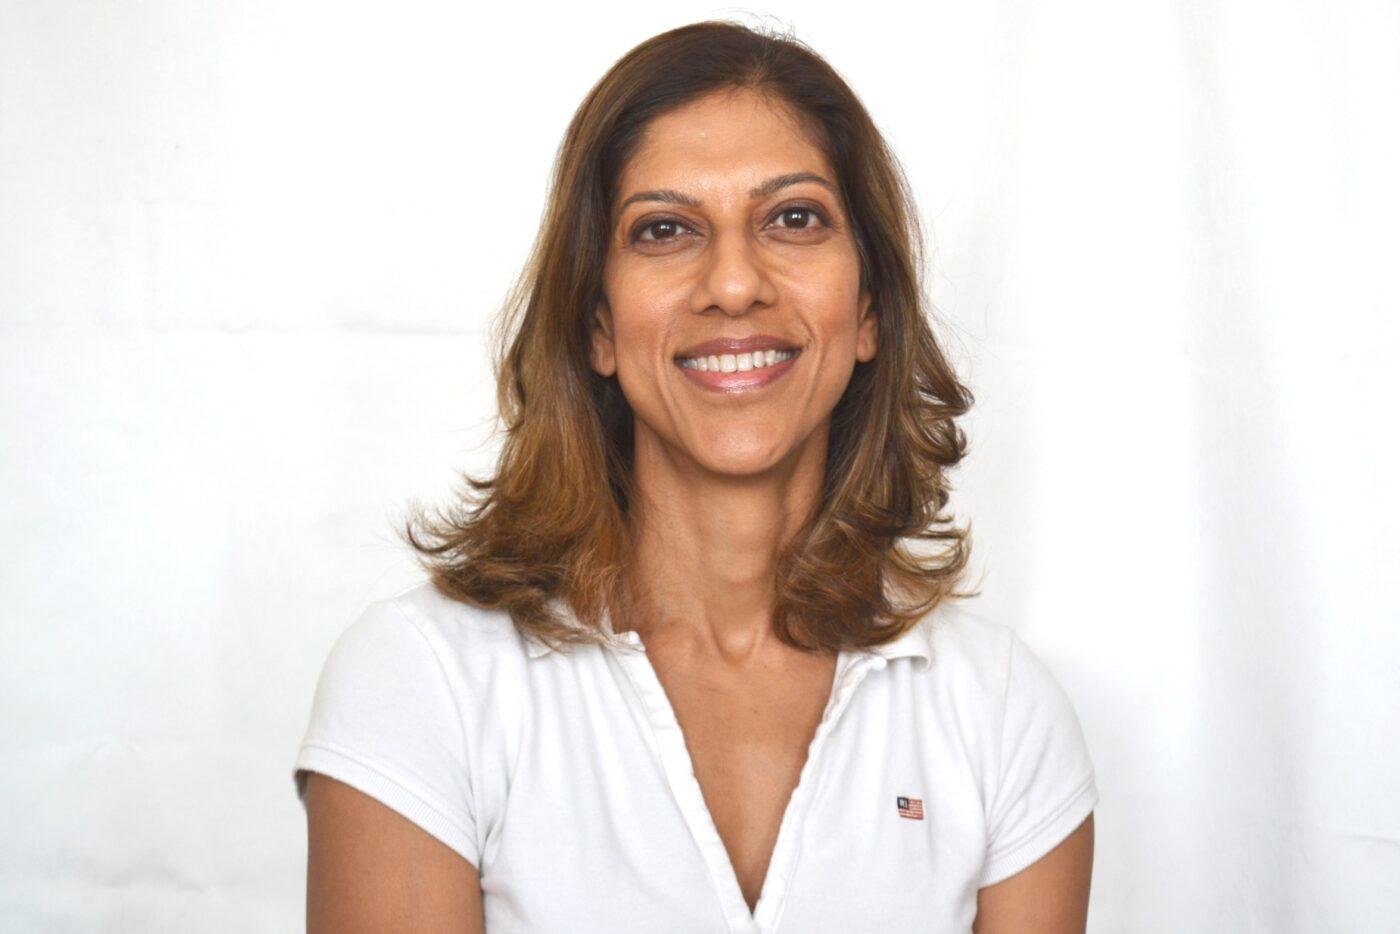 Meera Bhogal